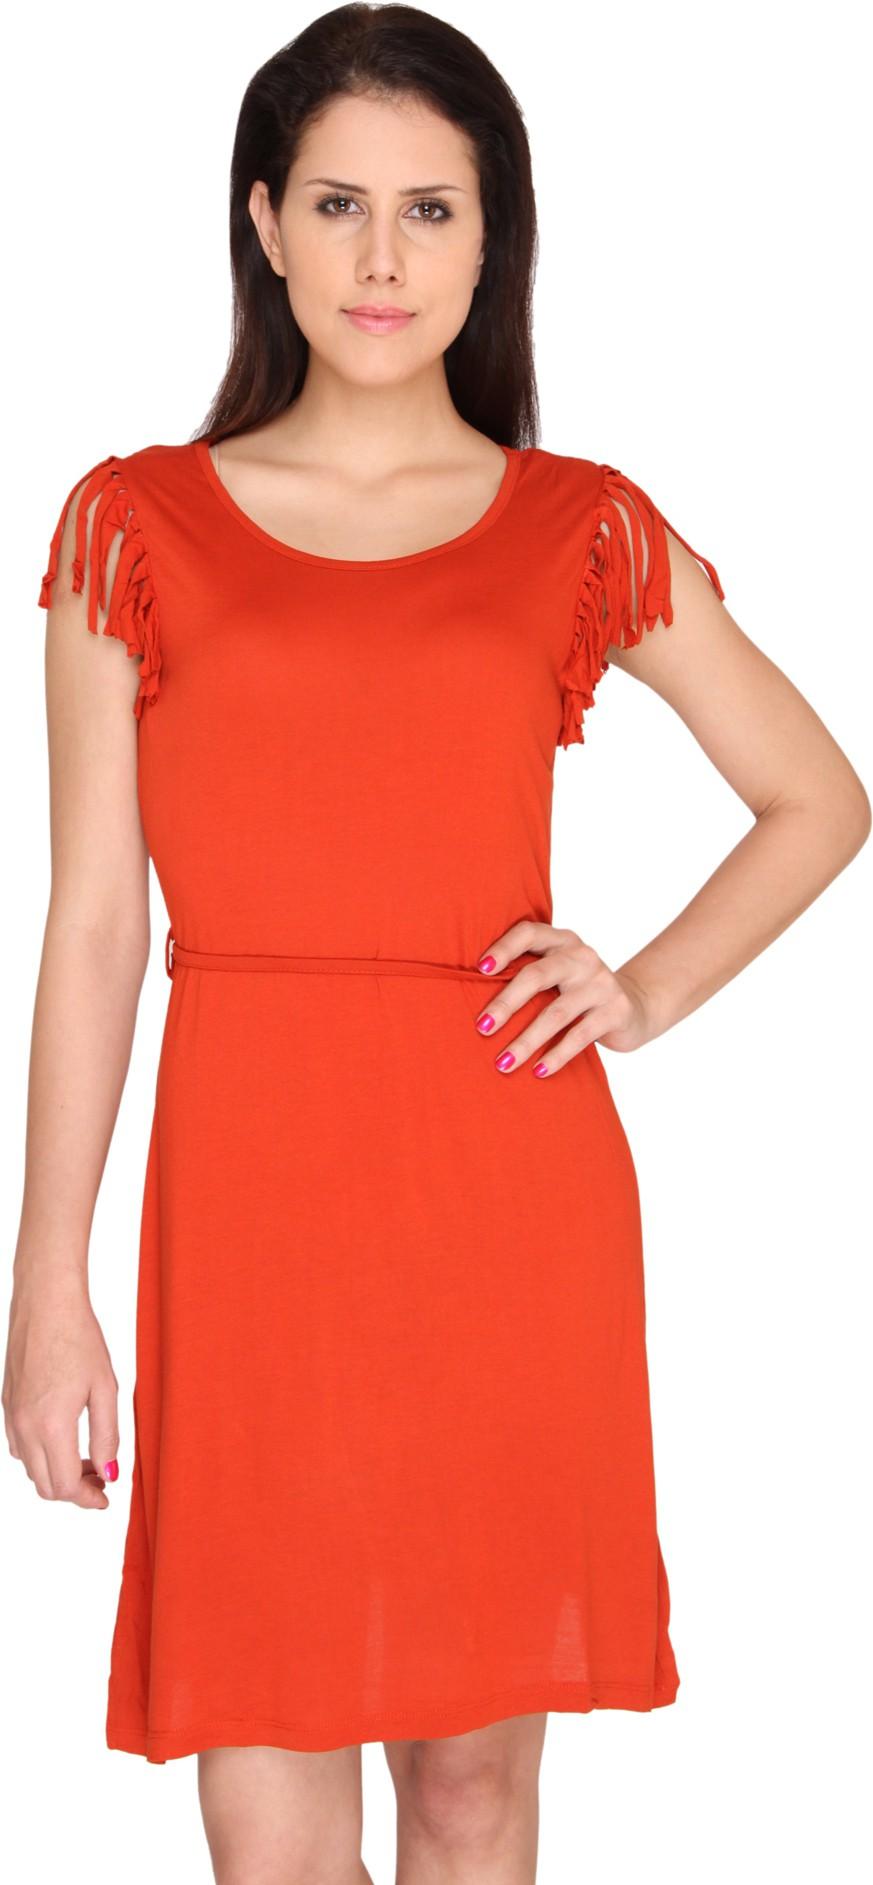 Bedazzle Womens Shift Orange Dress